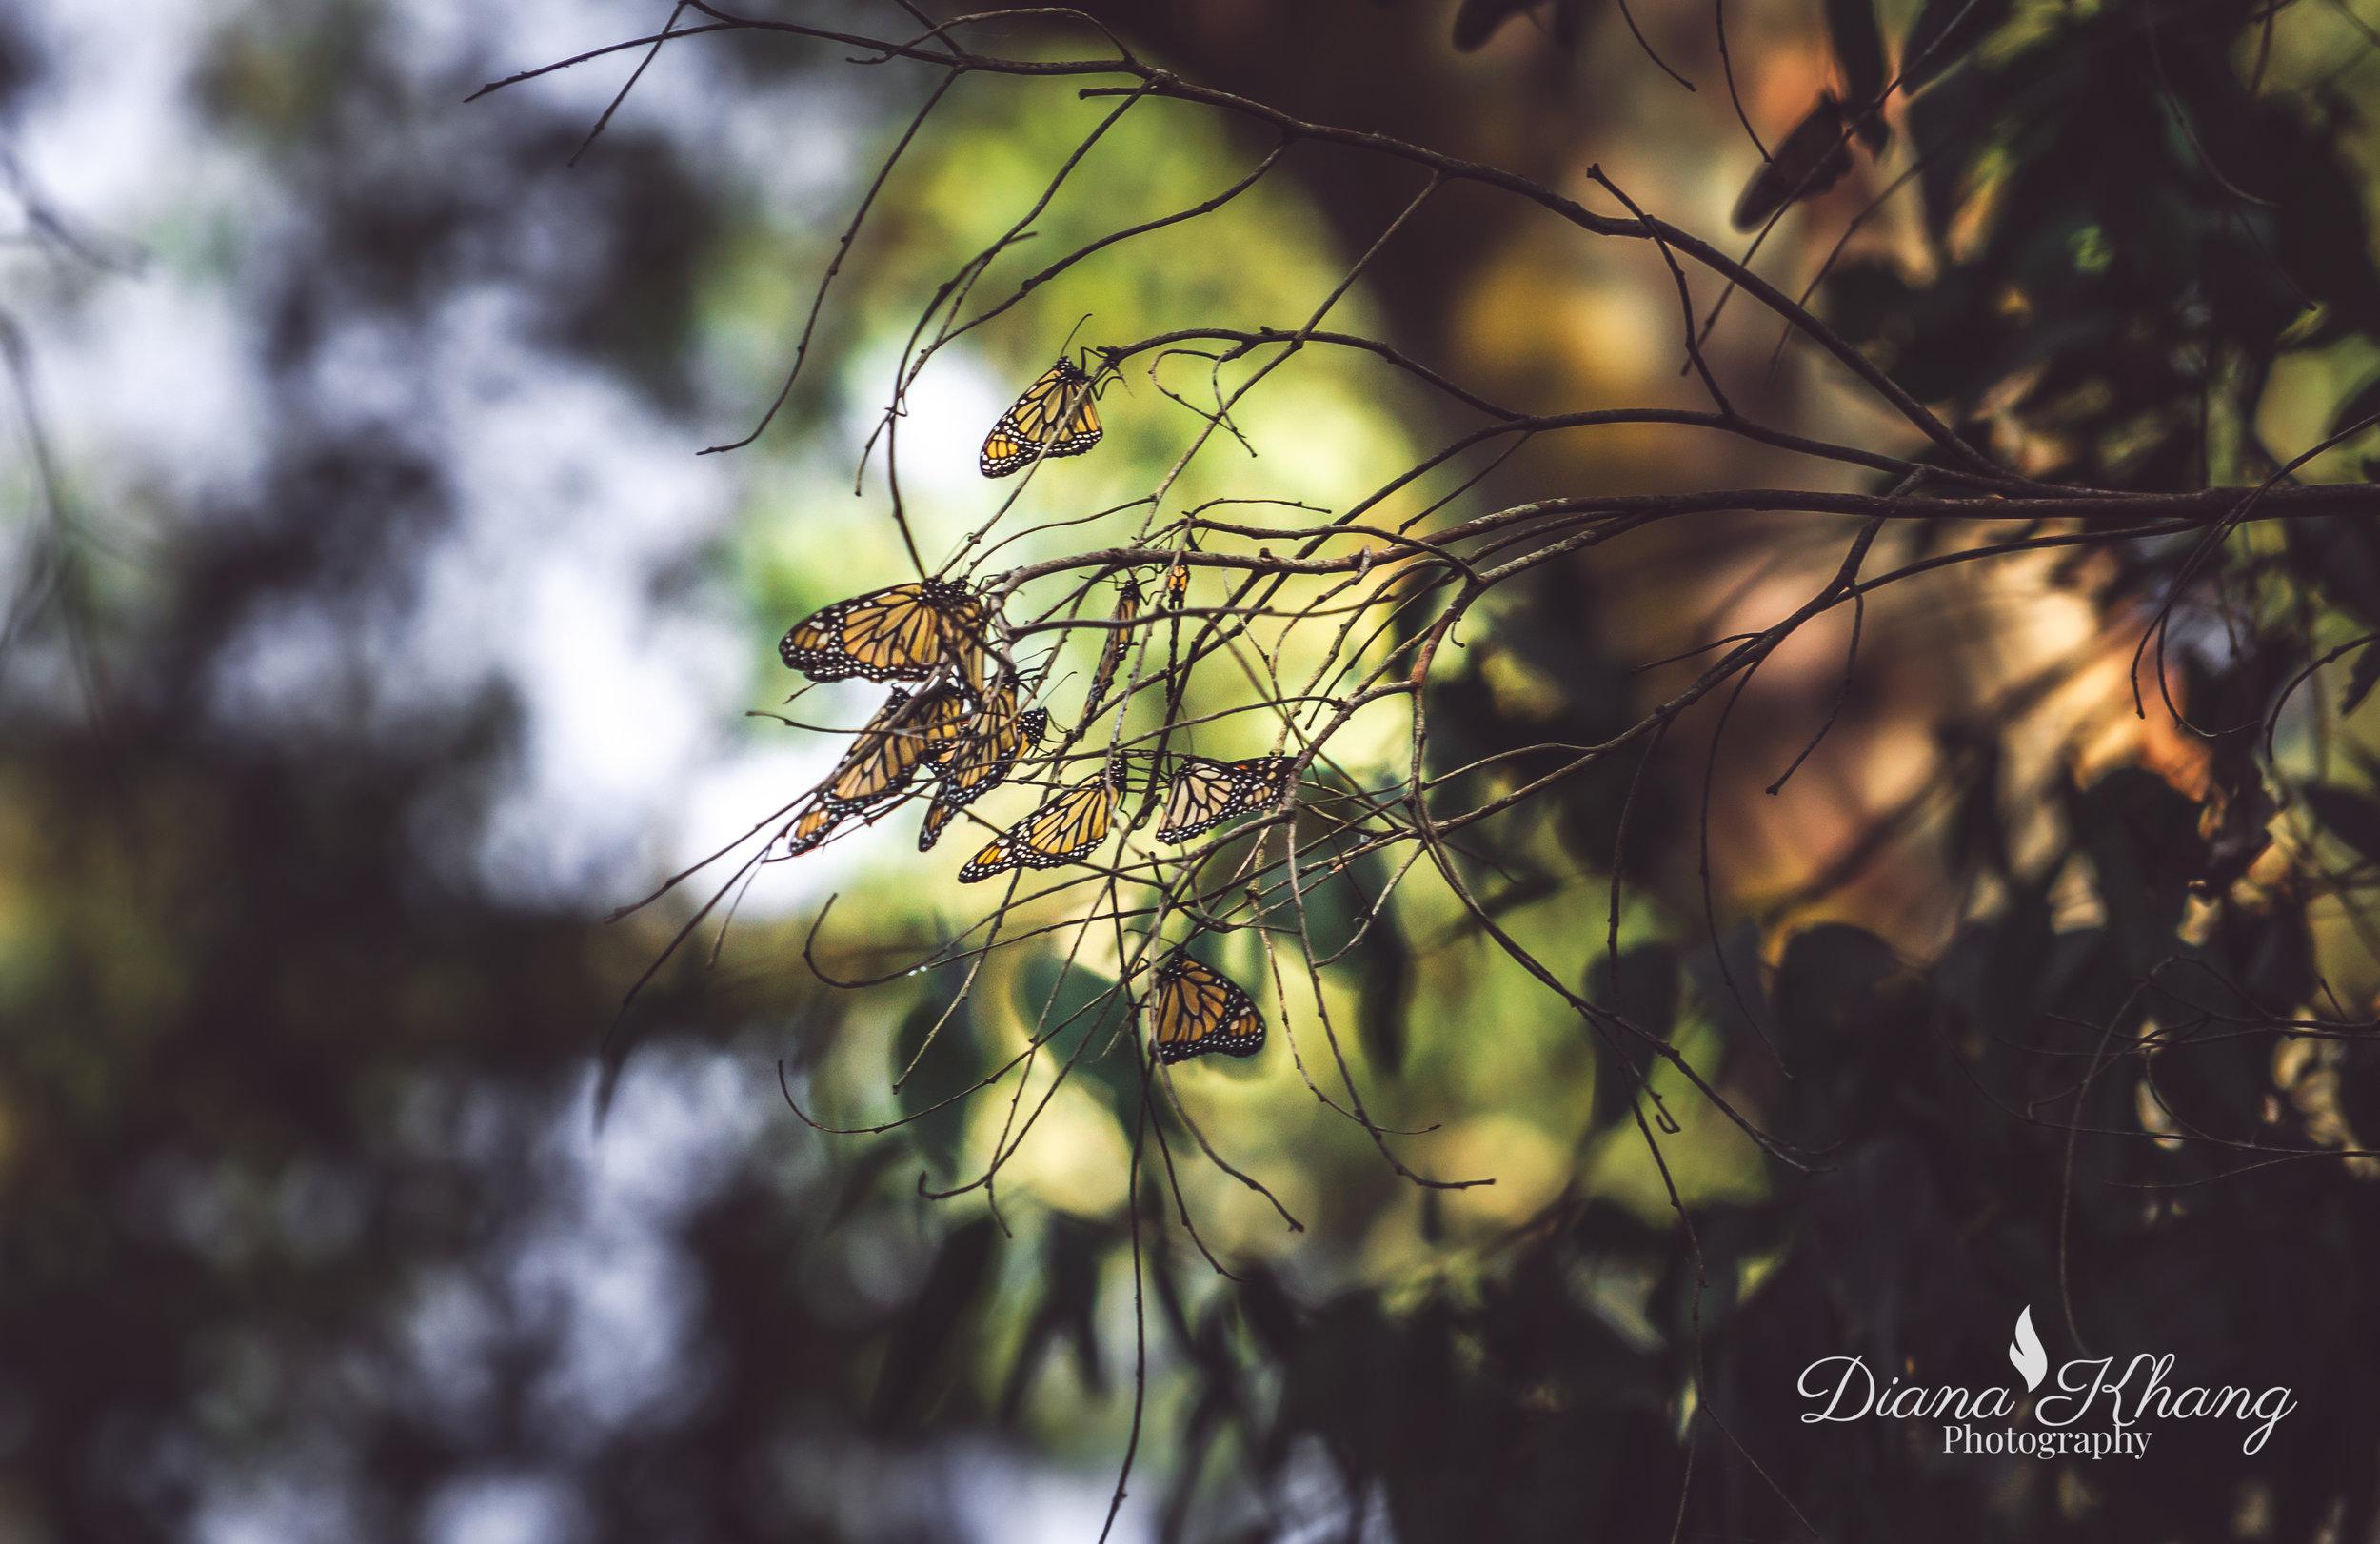 dianakhangphoto-3.jpg